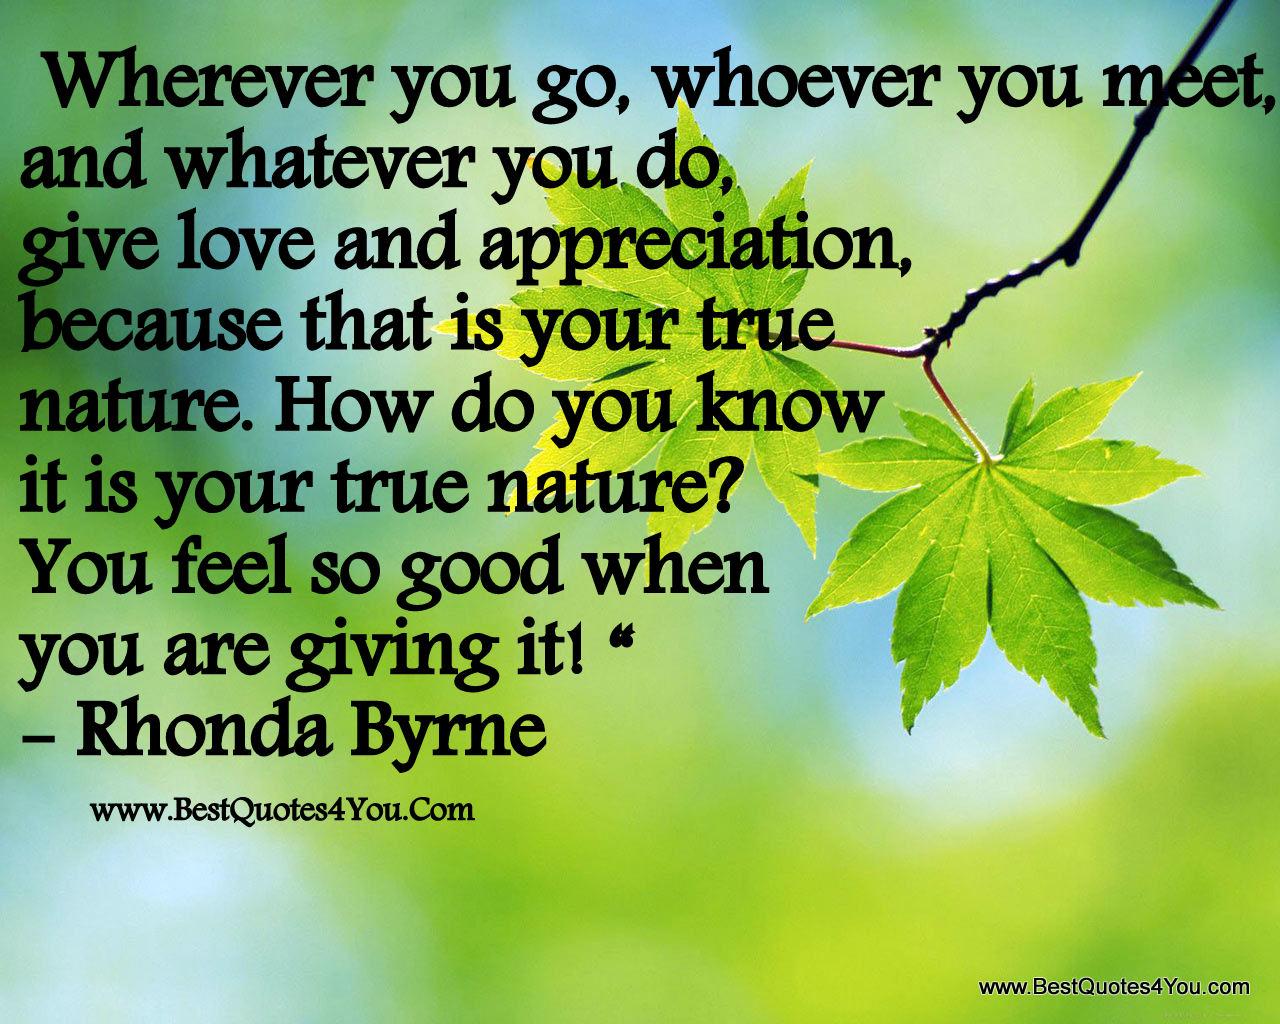 Rhonda Byrne's quote #8